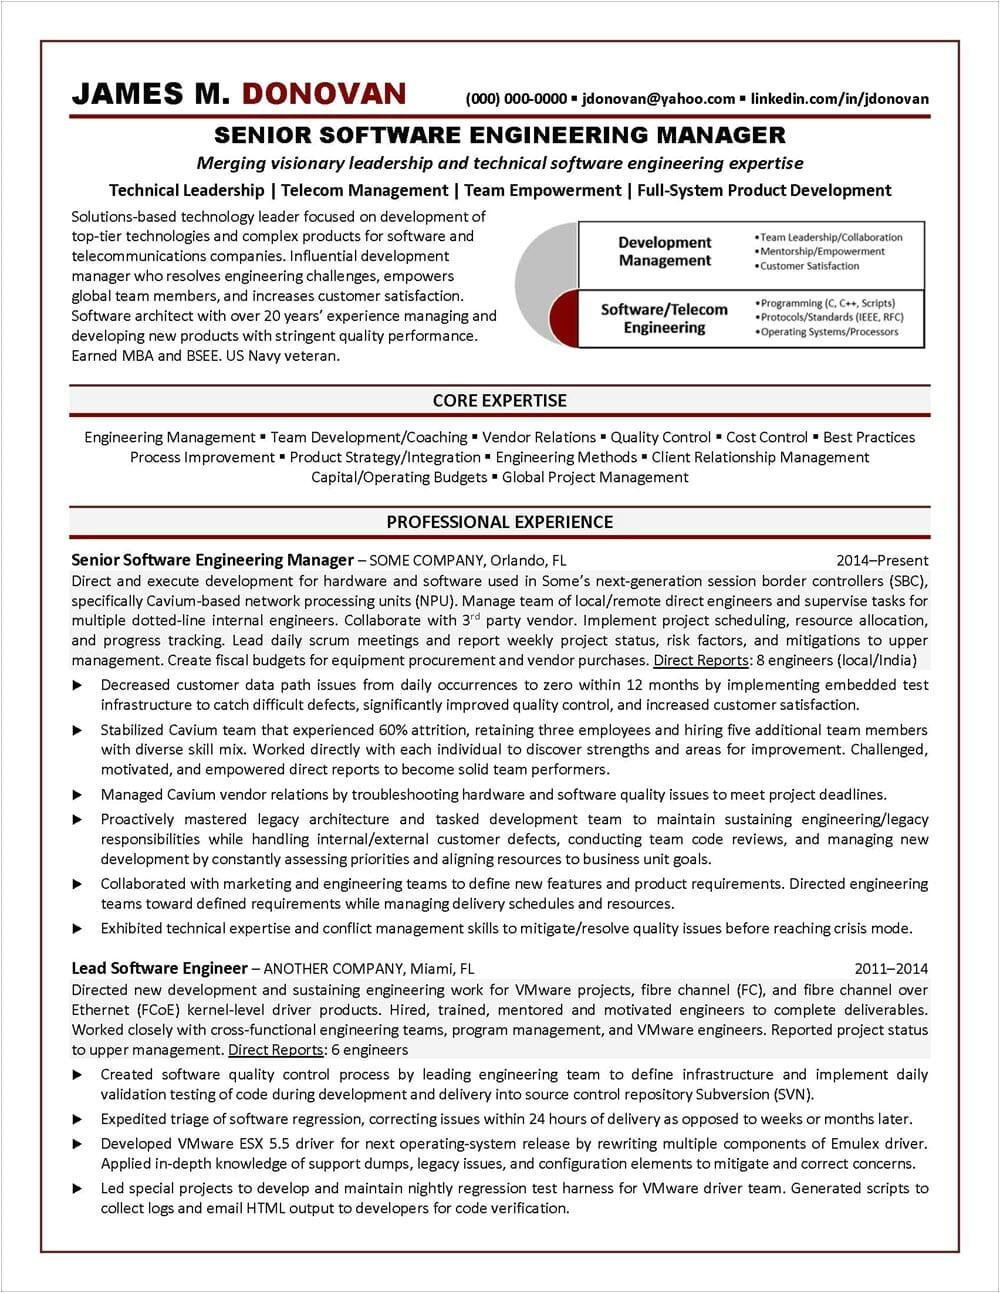 Engineer Coordinator Resume software Engineering Manager Resume Example Distinctive